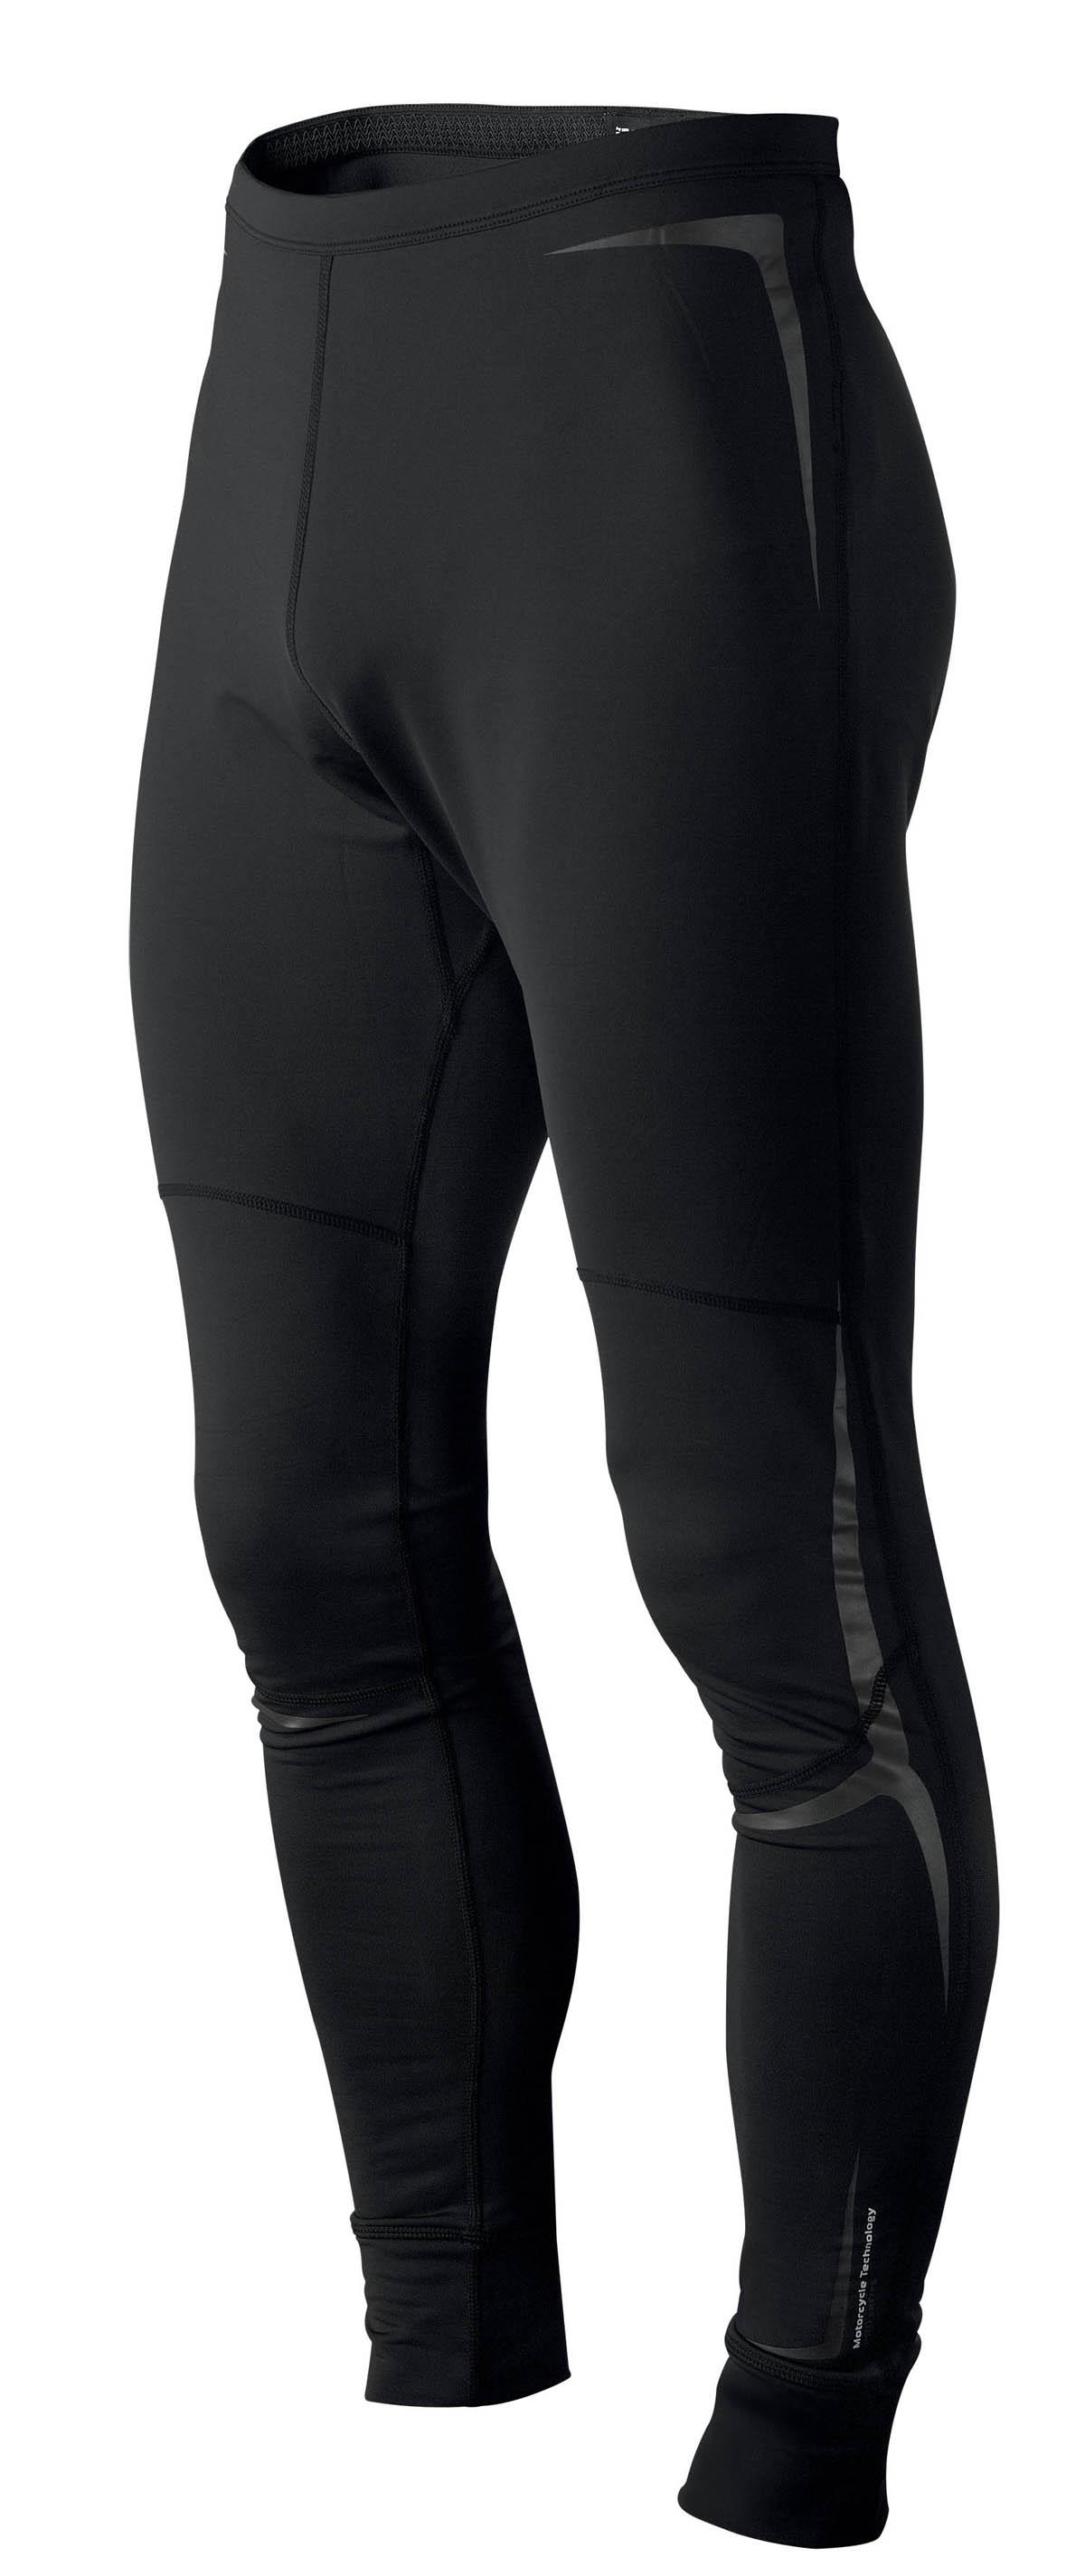 Sous-Vetement Pantalon Noir - Dane